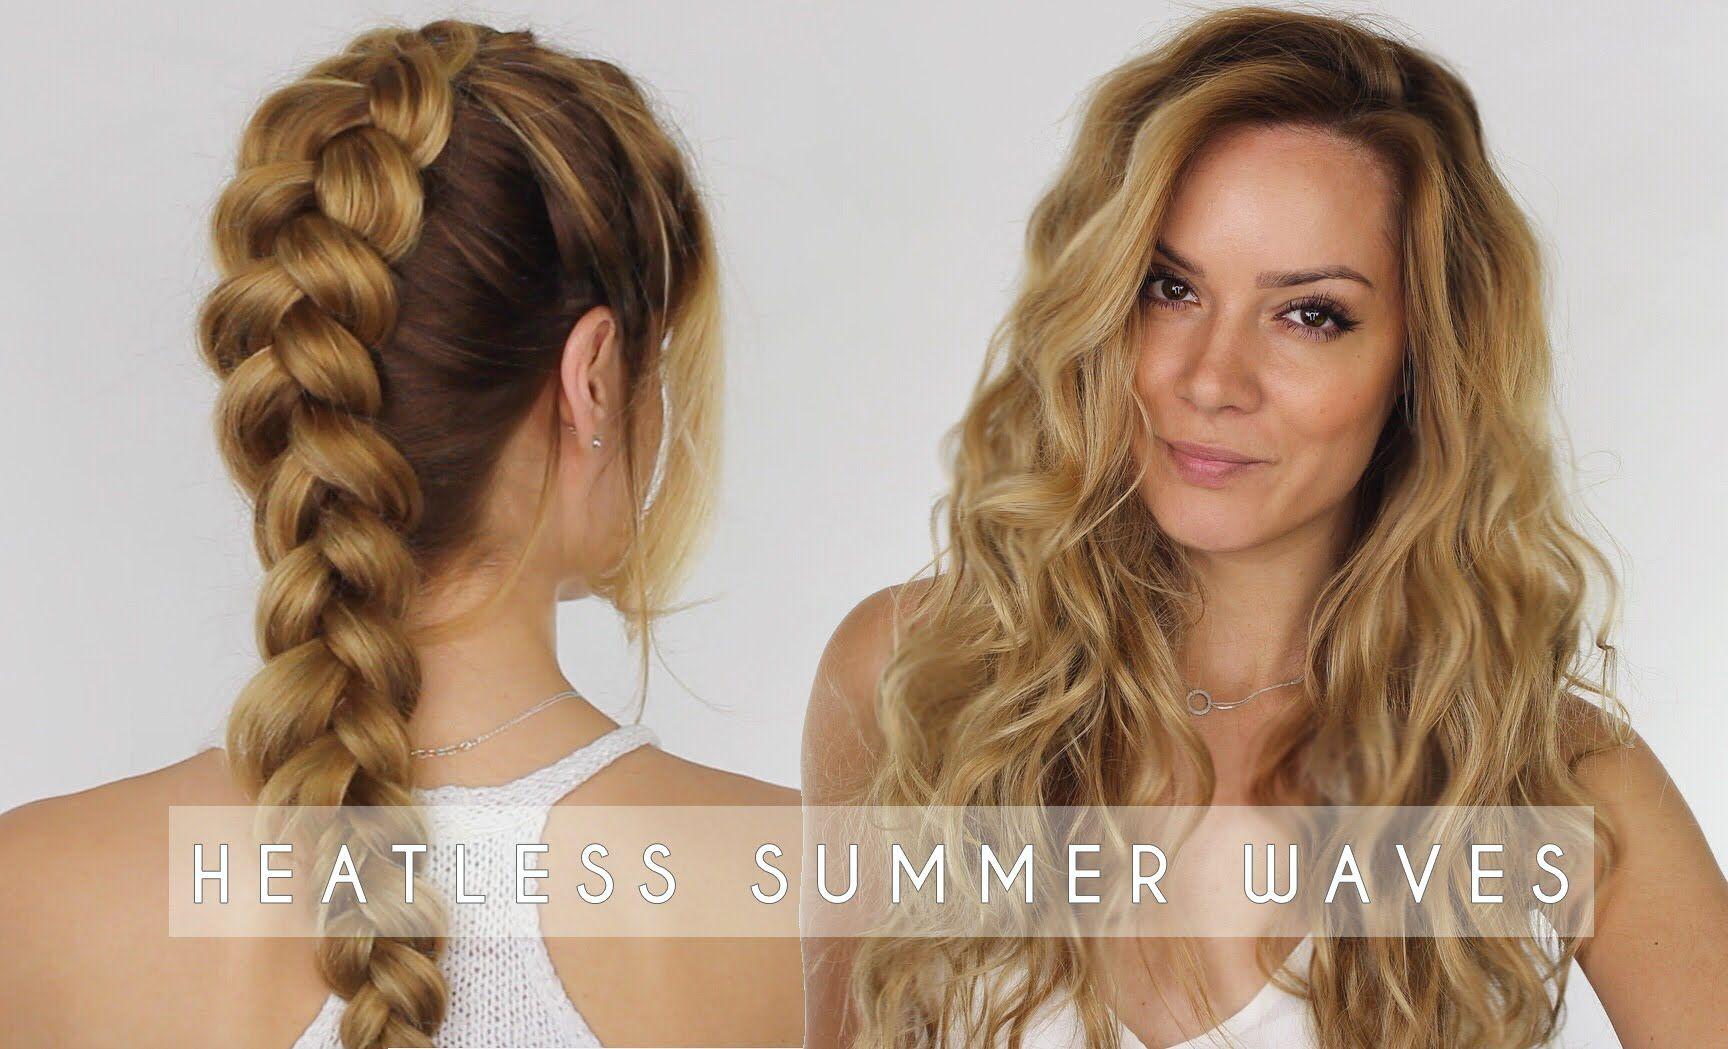 Waves Hairstyle Heatless Summer Waves Hair Tutorial  Dutch Braid Hair Tutorial